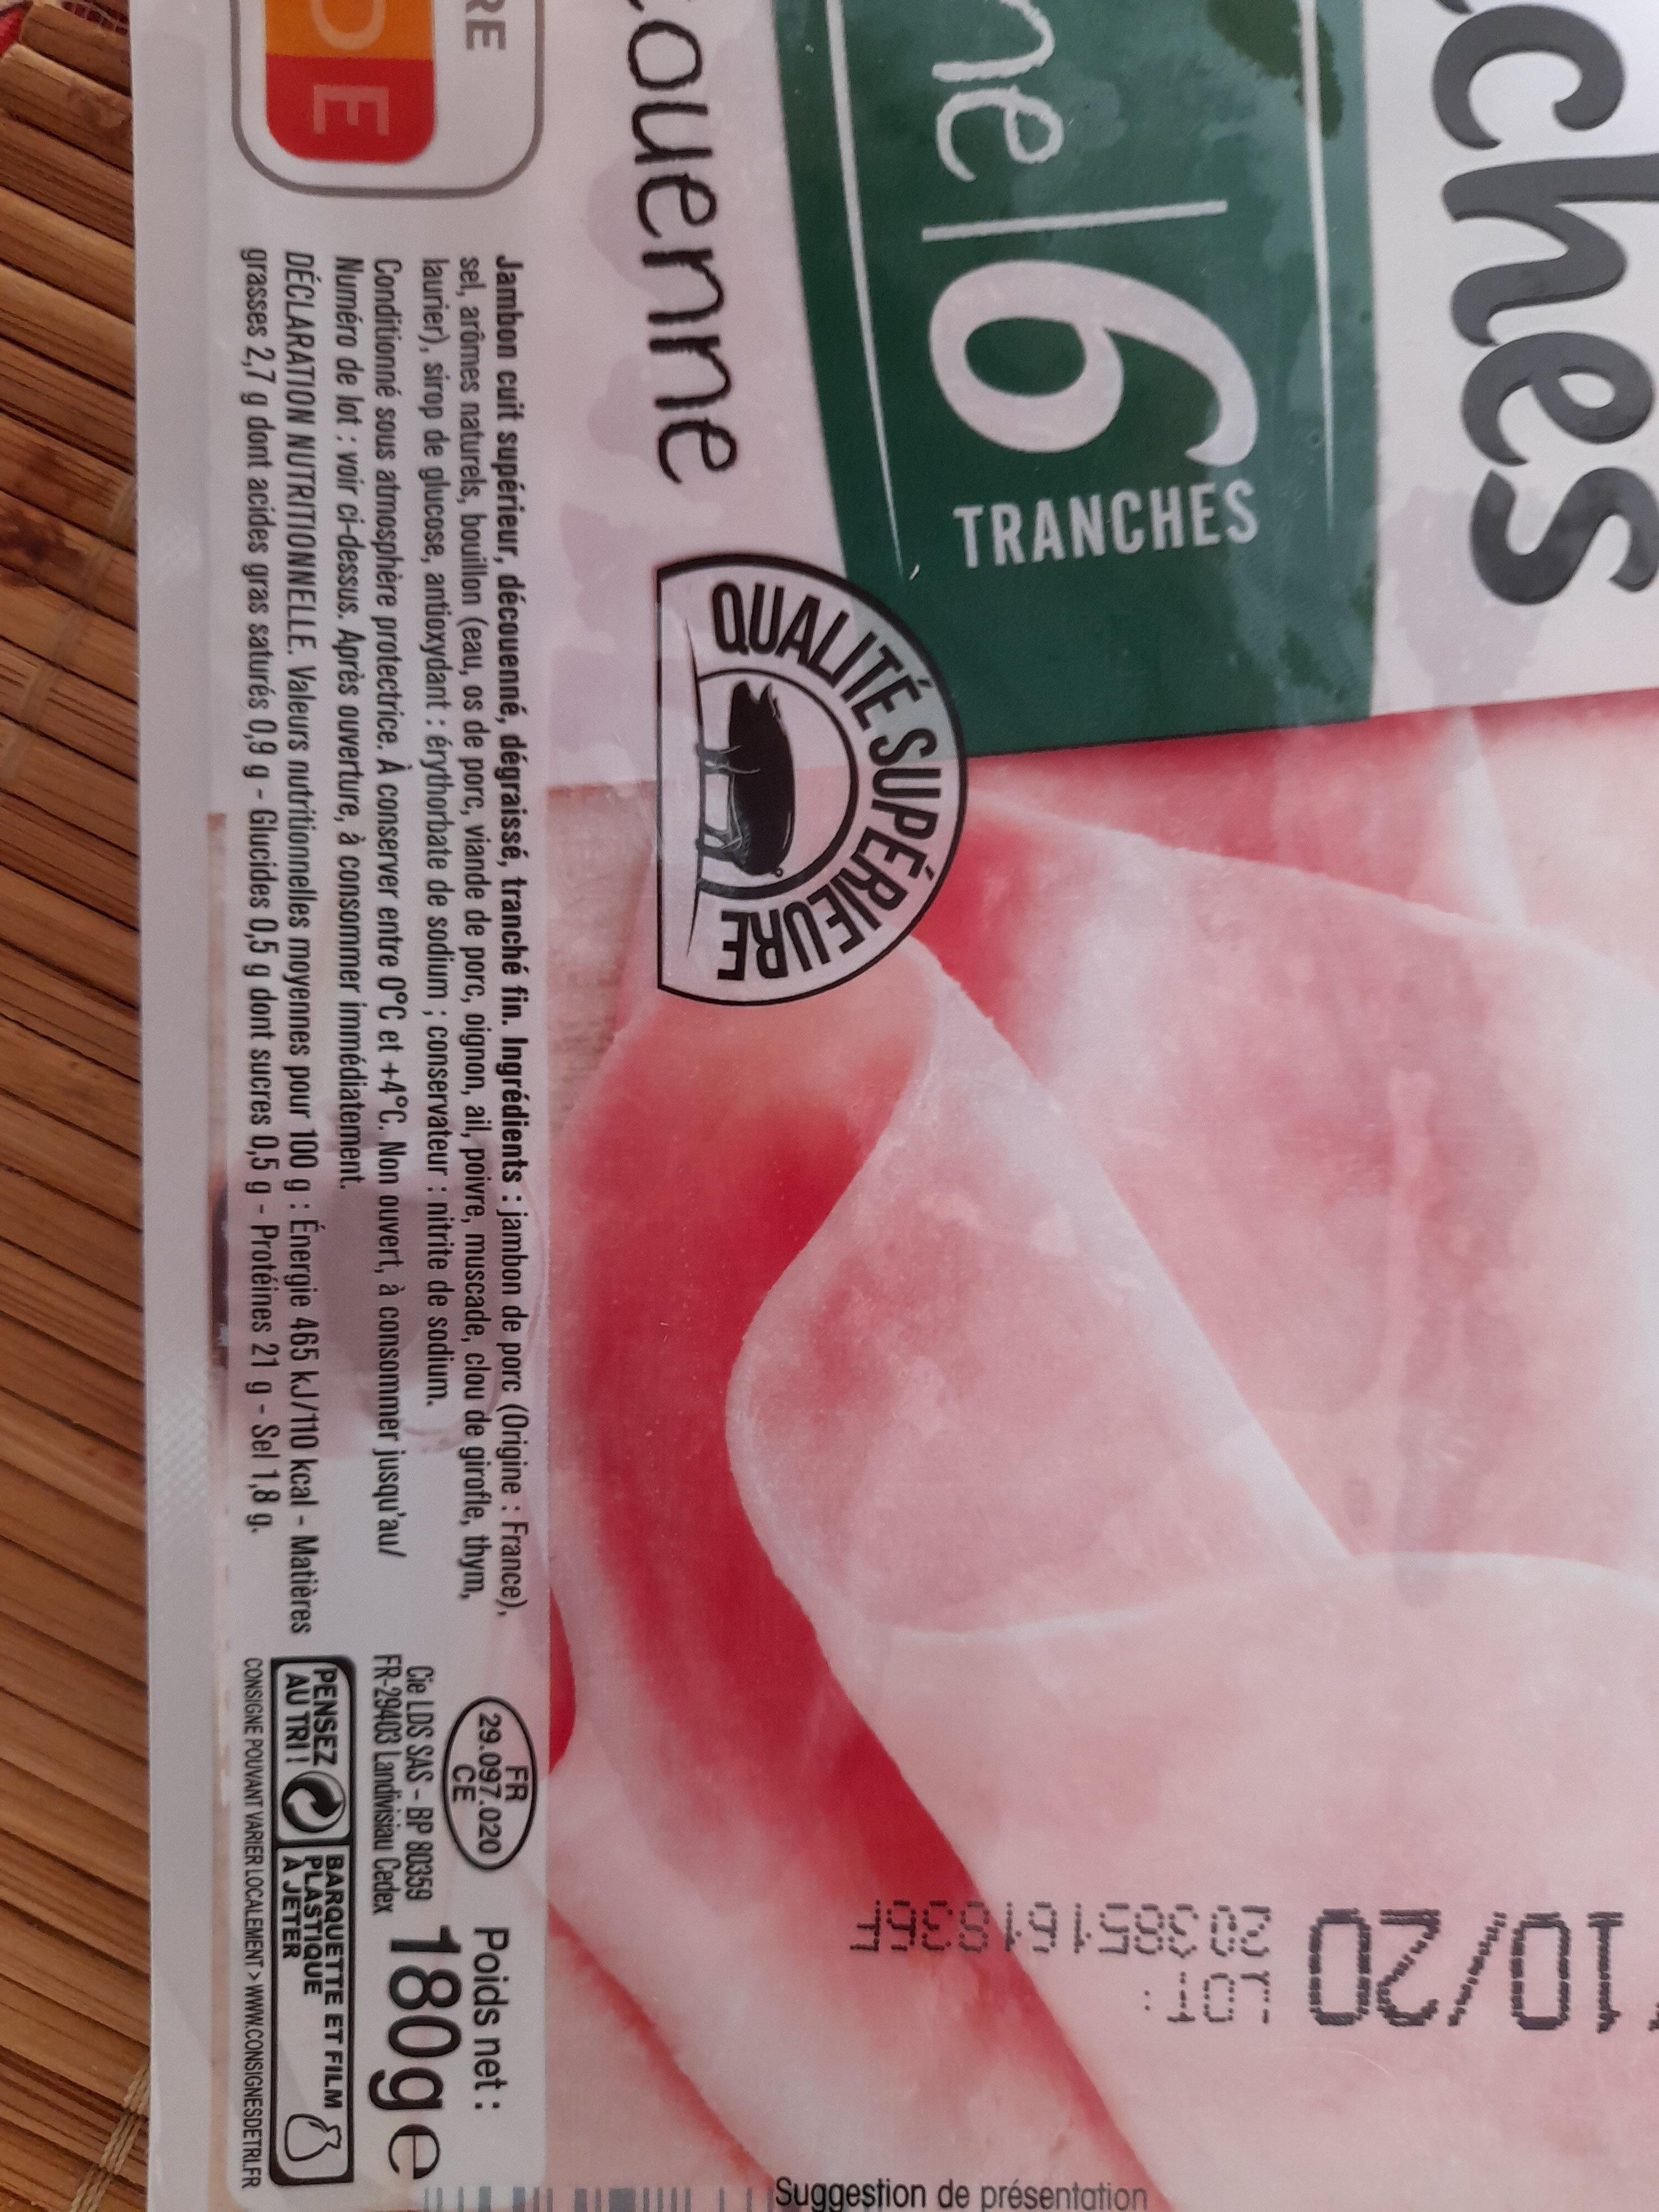 Fines tranches à l'italienne - Ingrediënten - fr